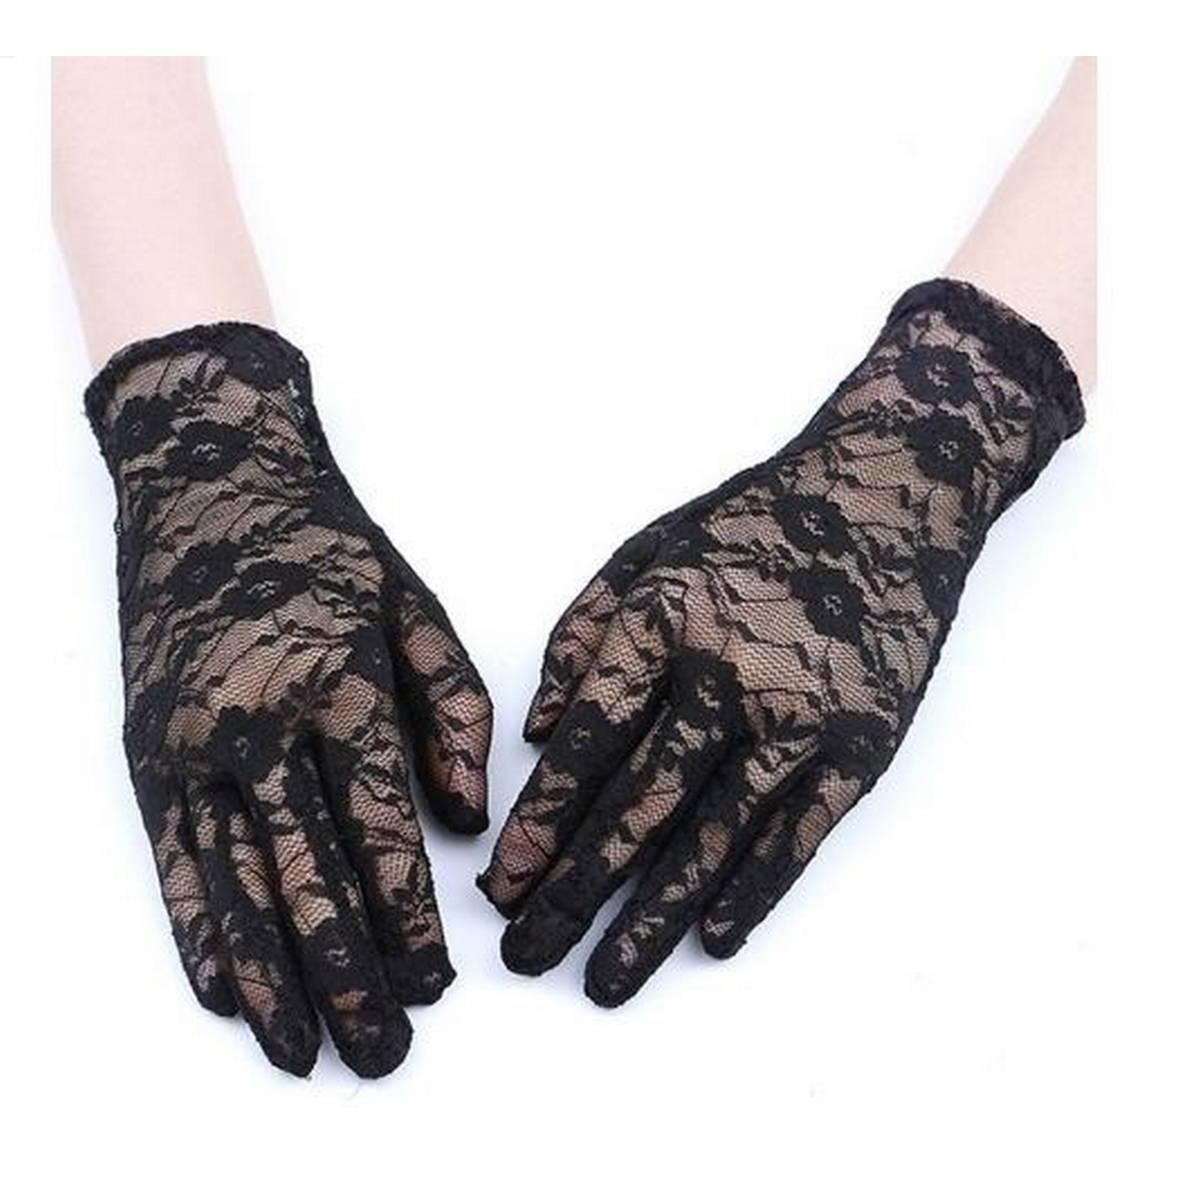 Summer Short Lace Gloves UV Protection Full Finger Gloves Outdoor Driving Gloves Wedding Lace Gloves for Women